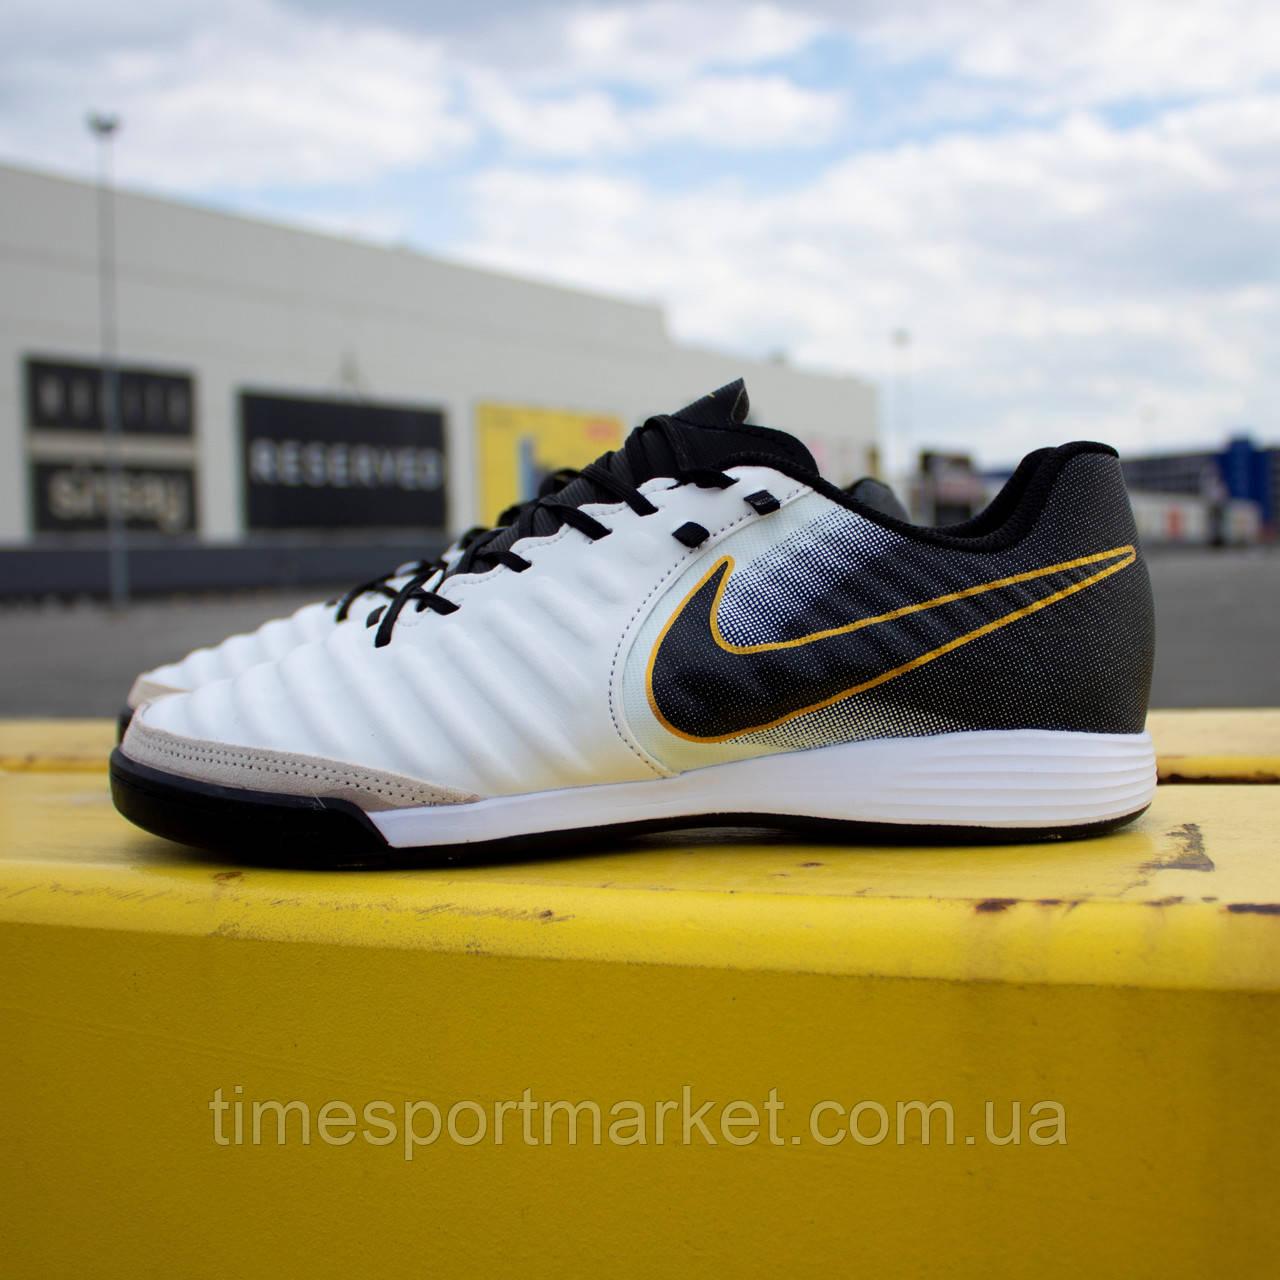 Футзалки Nike Tiempo Lunar LegendX 7 Pro IC (39-45)